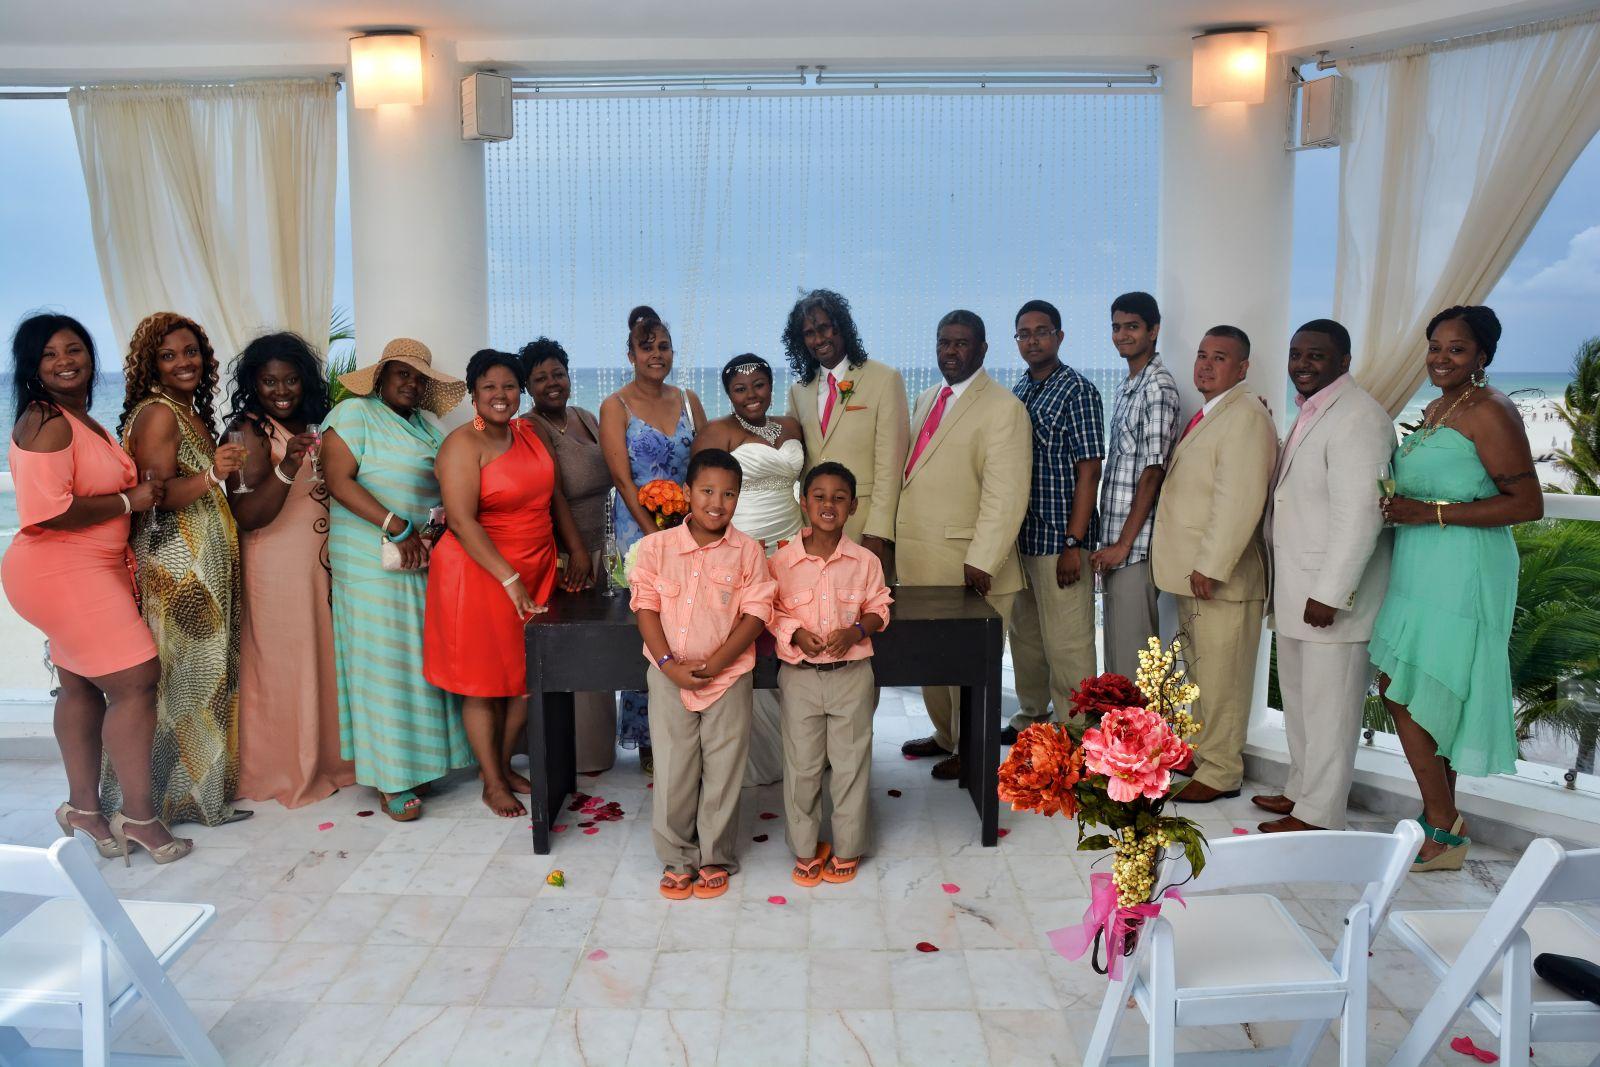 June 2013 Playacar Palace Brides